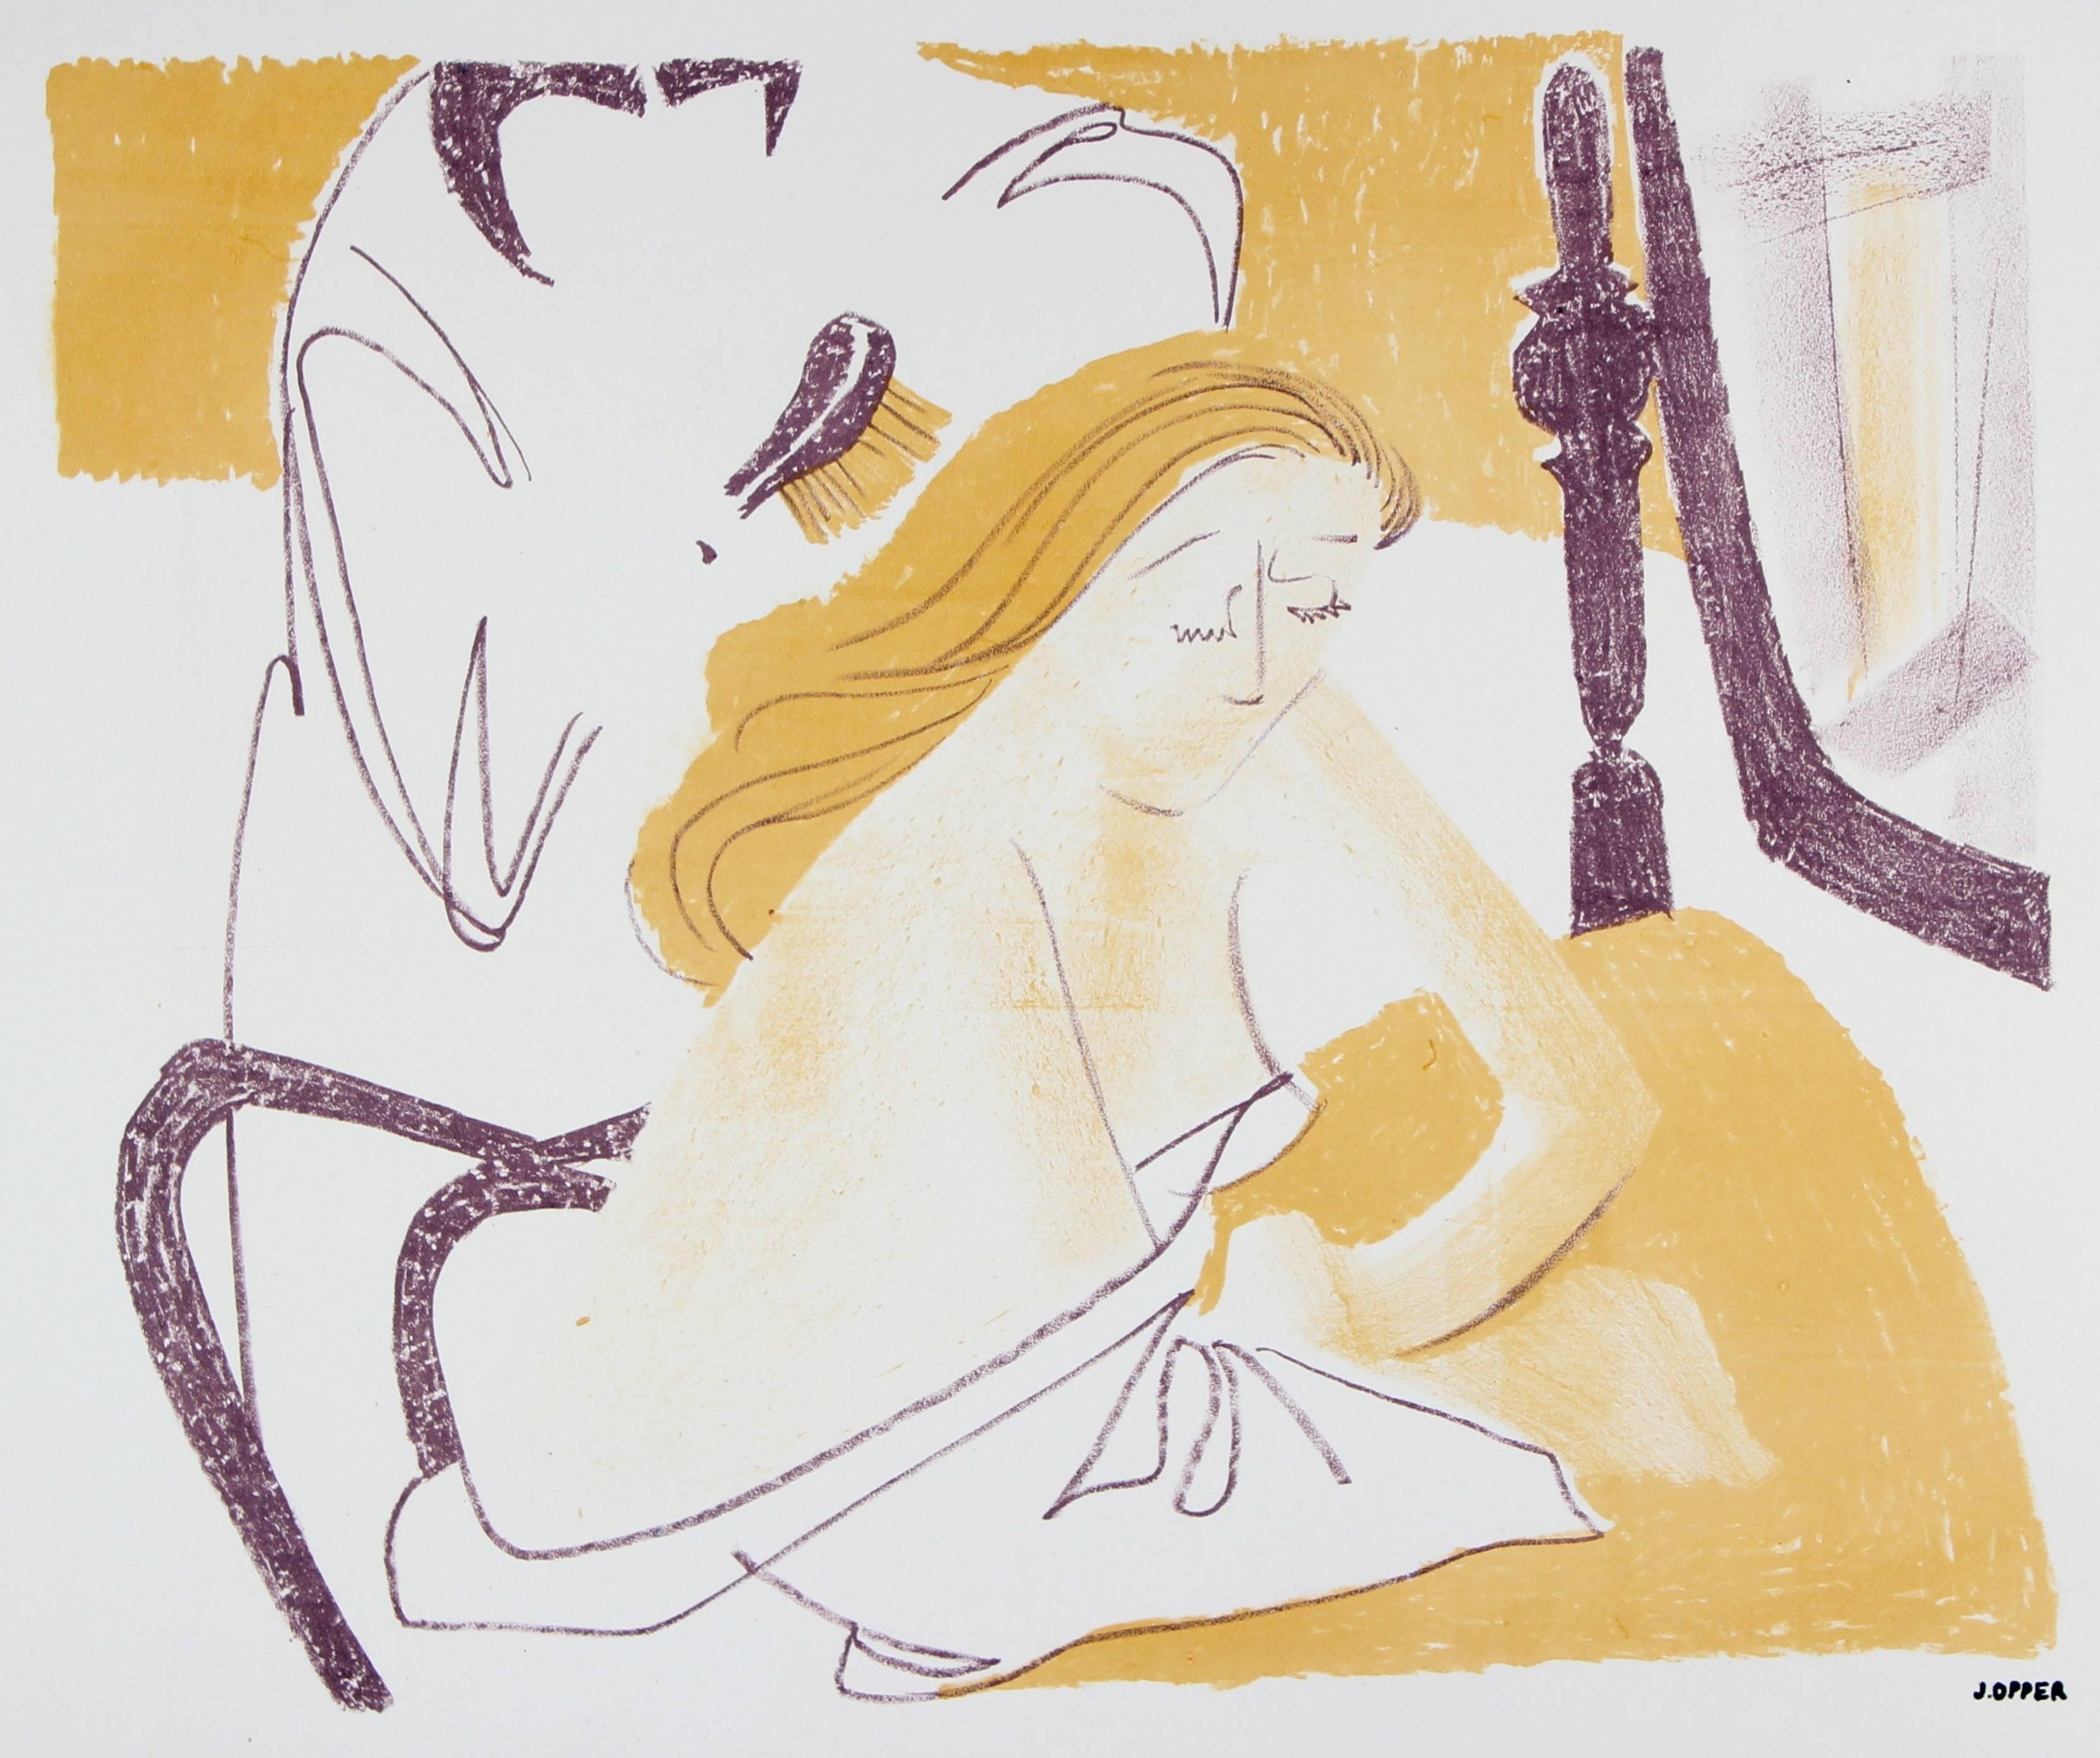 Mid Century Bedroom Scene, Lithograph Print on Paper, Circa 1950s